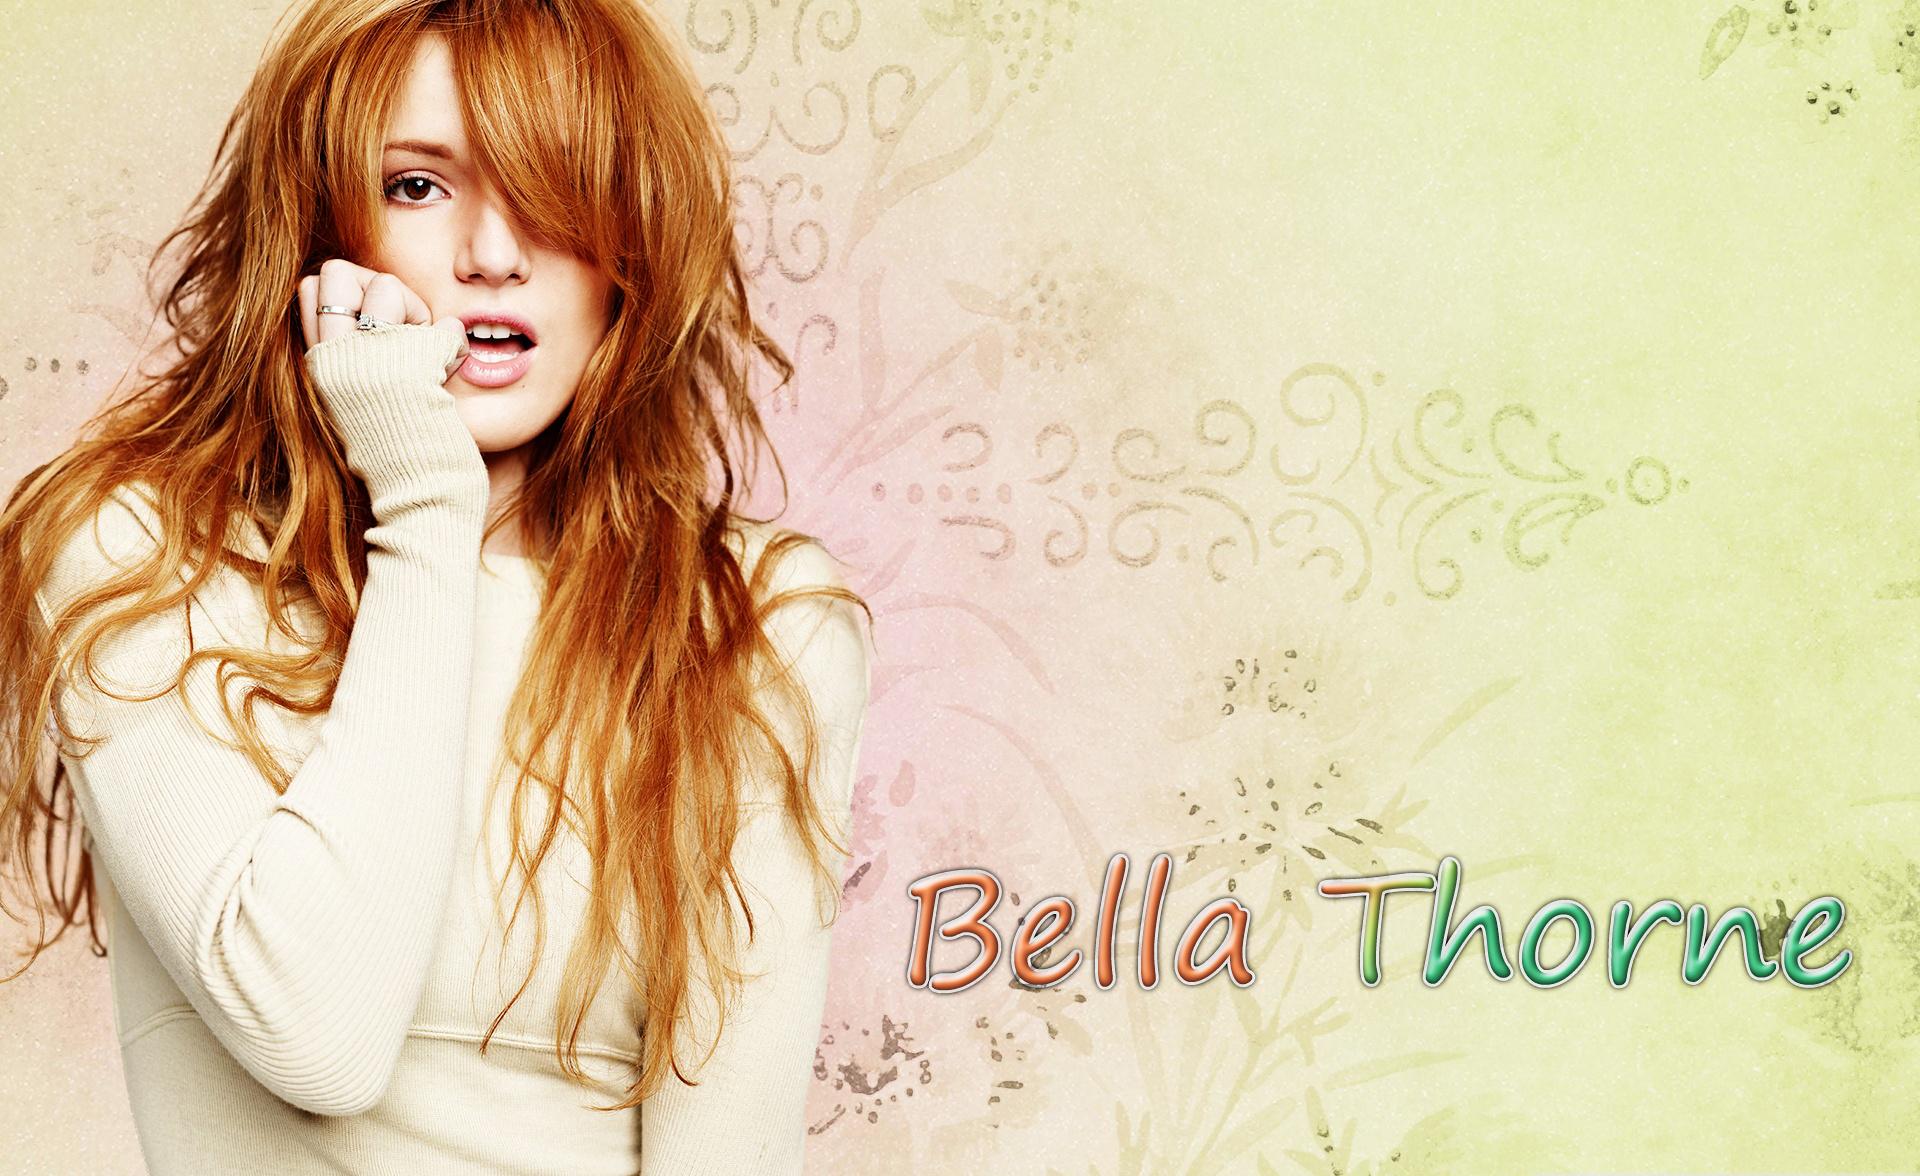 Facebook covers for bella thorne - Bella thorne wallpaper ...